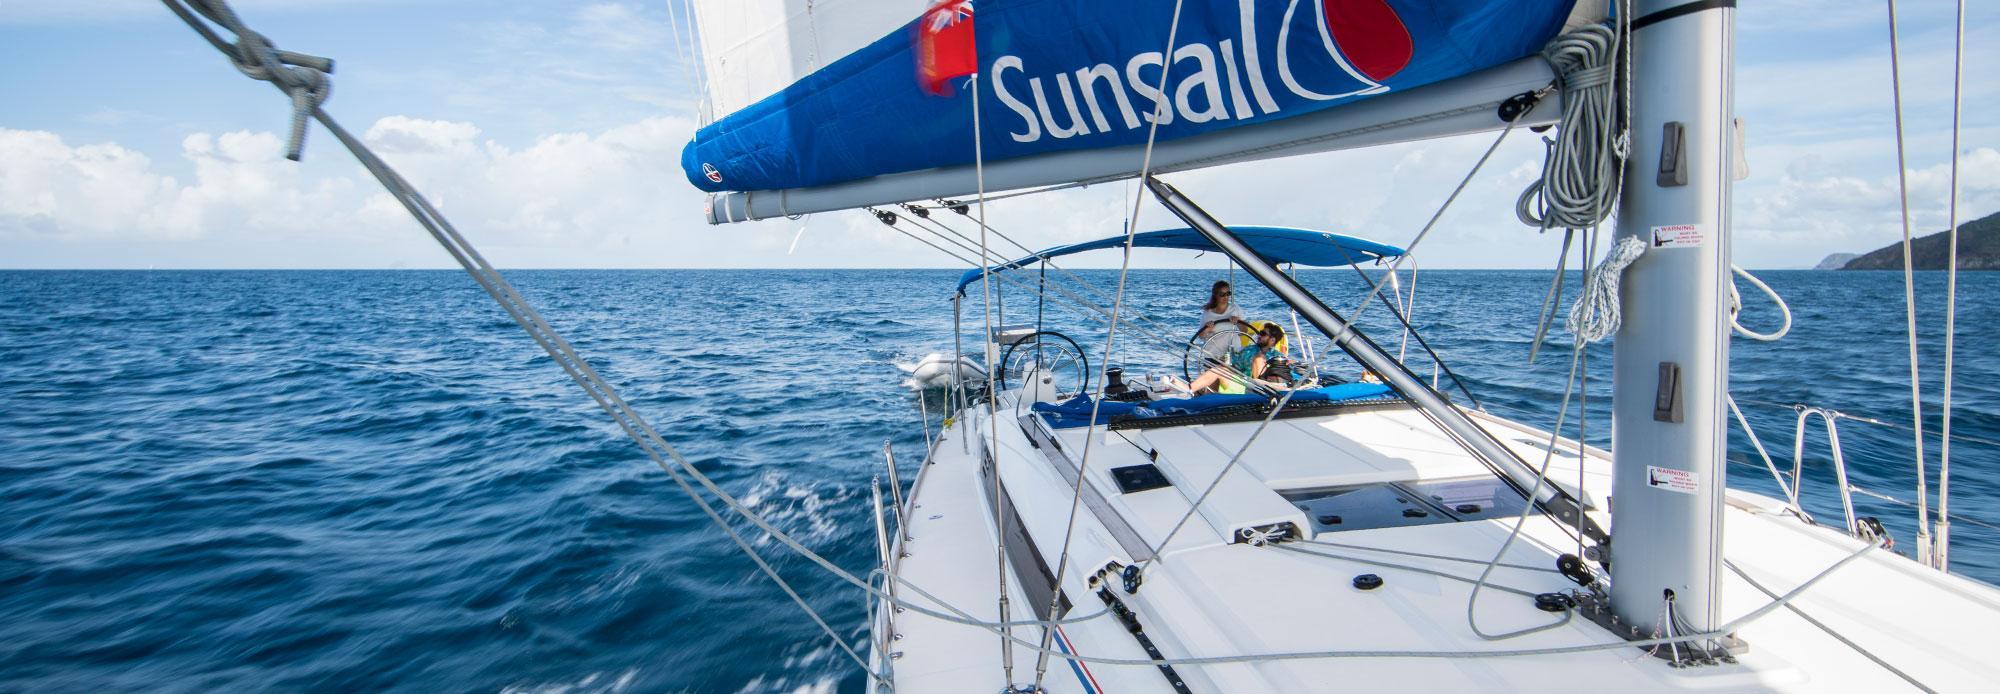 Sunsail Yacht Ownership